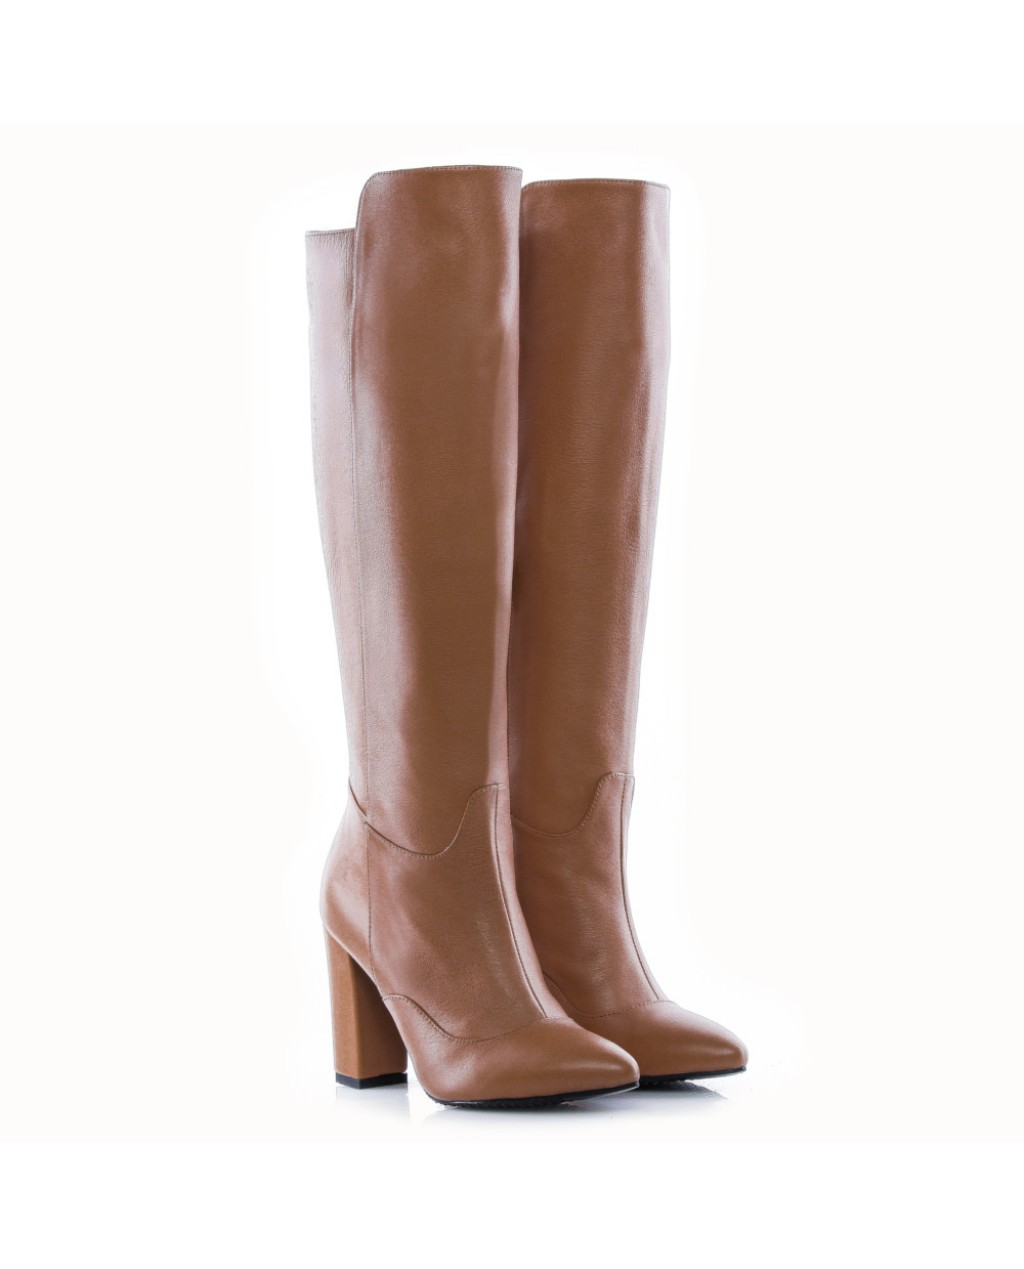 Ce cizme de dama alegem? Cu toc sau fara?